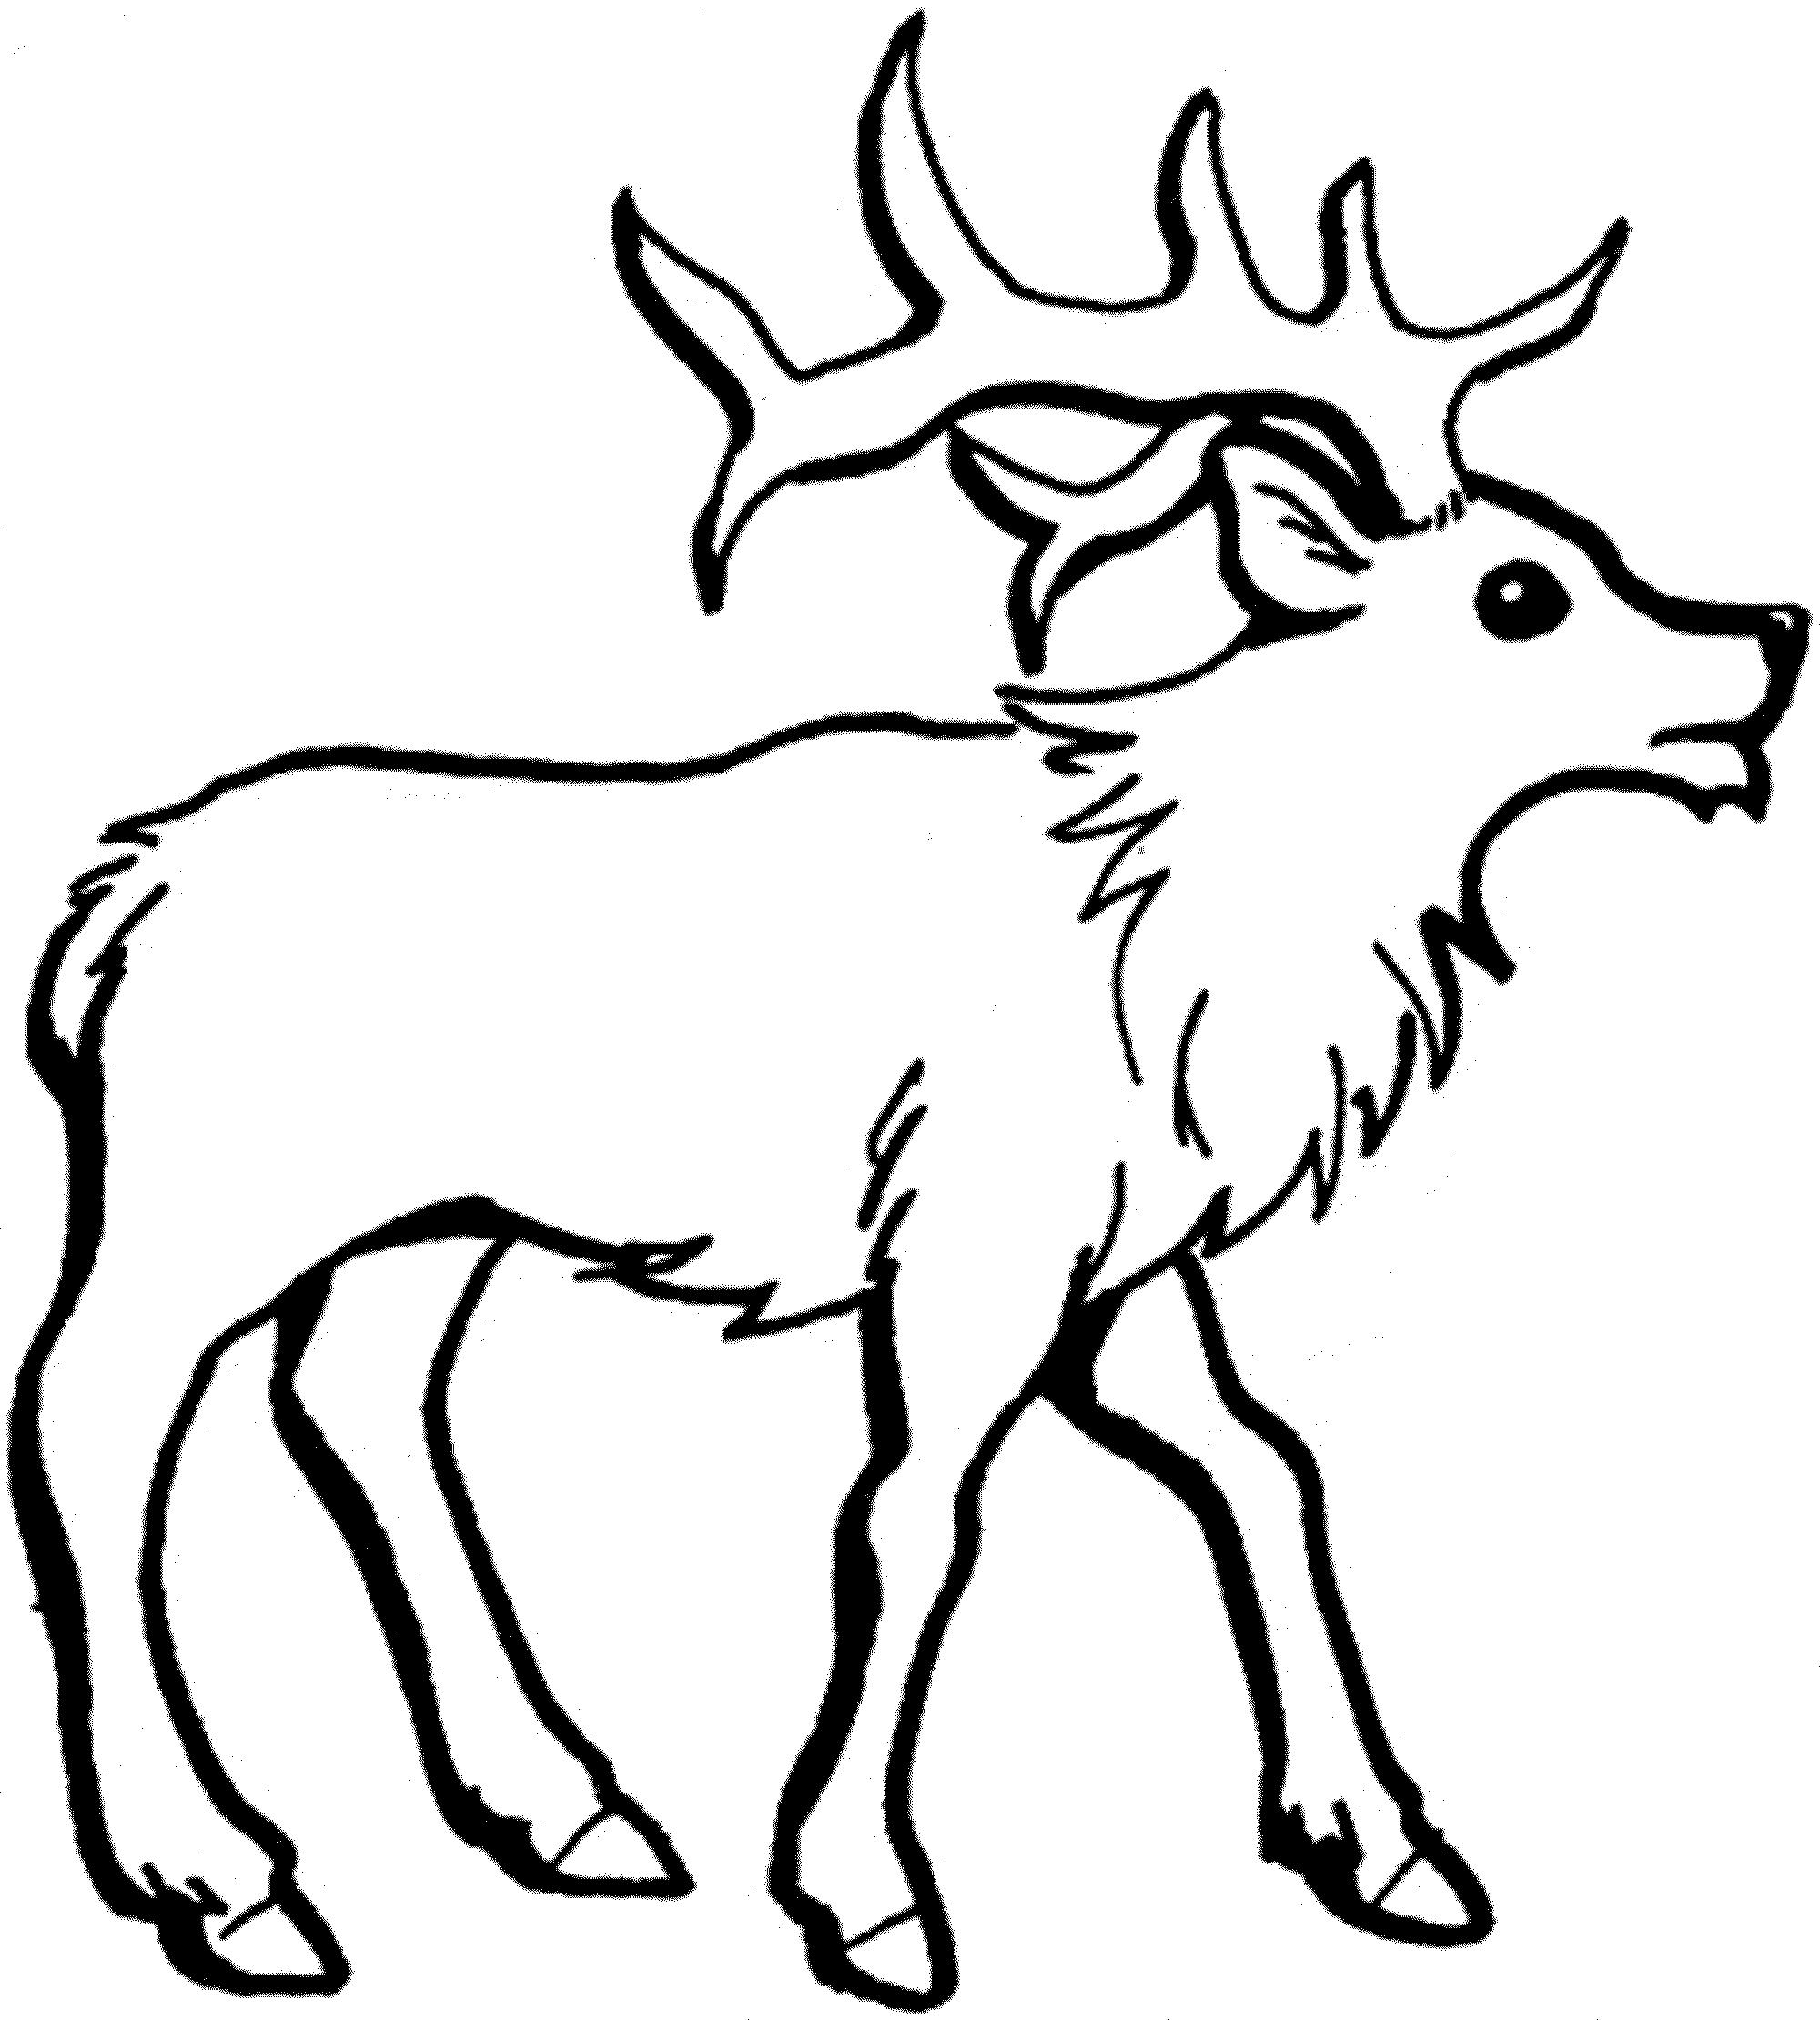 Deer Coloring Pages